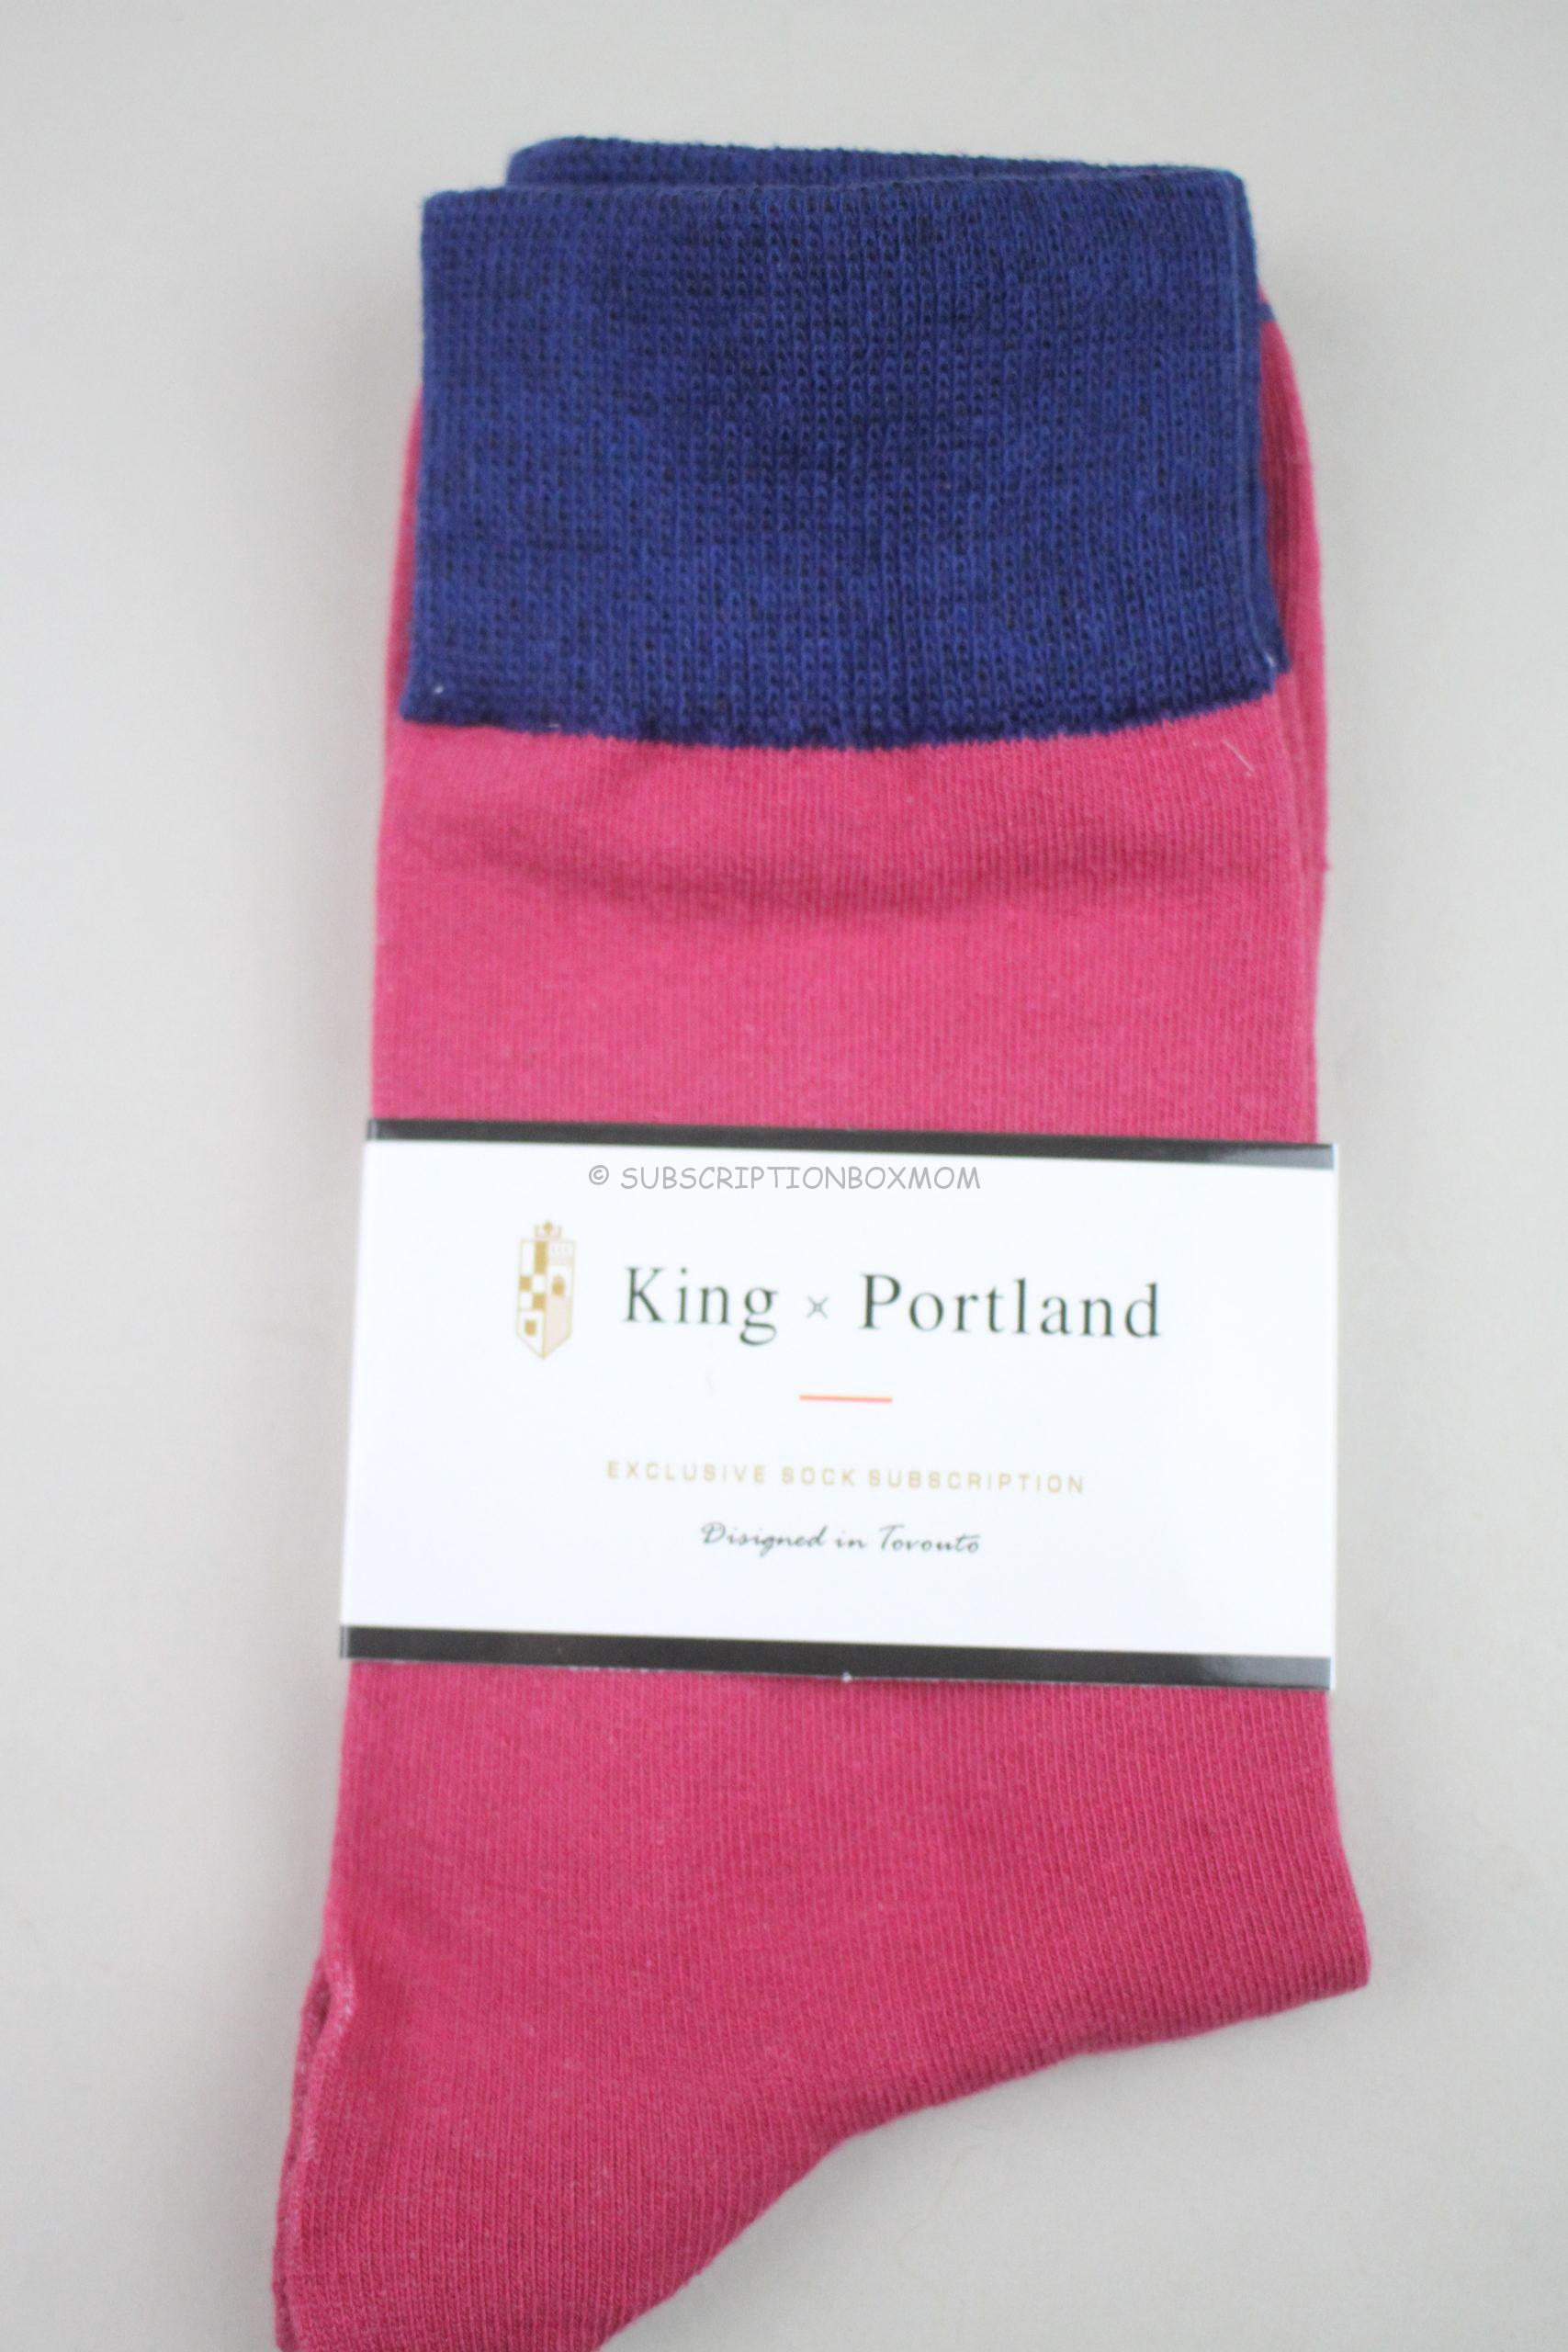 King X Portland Sock